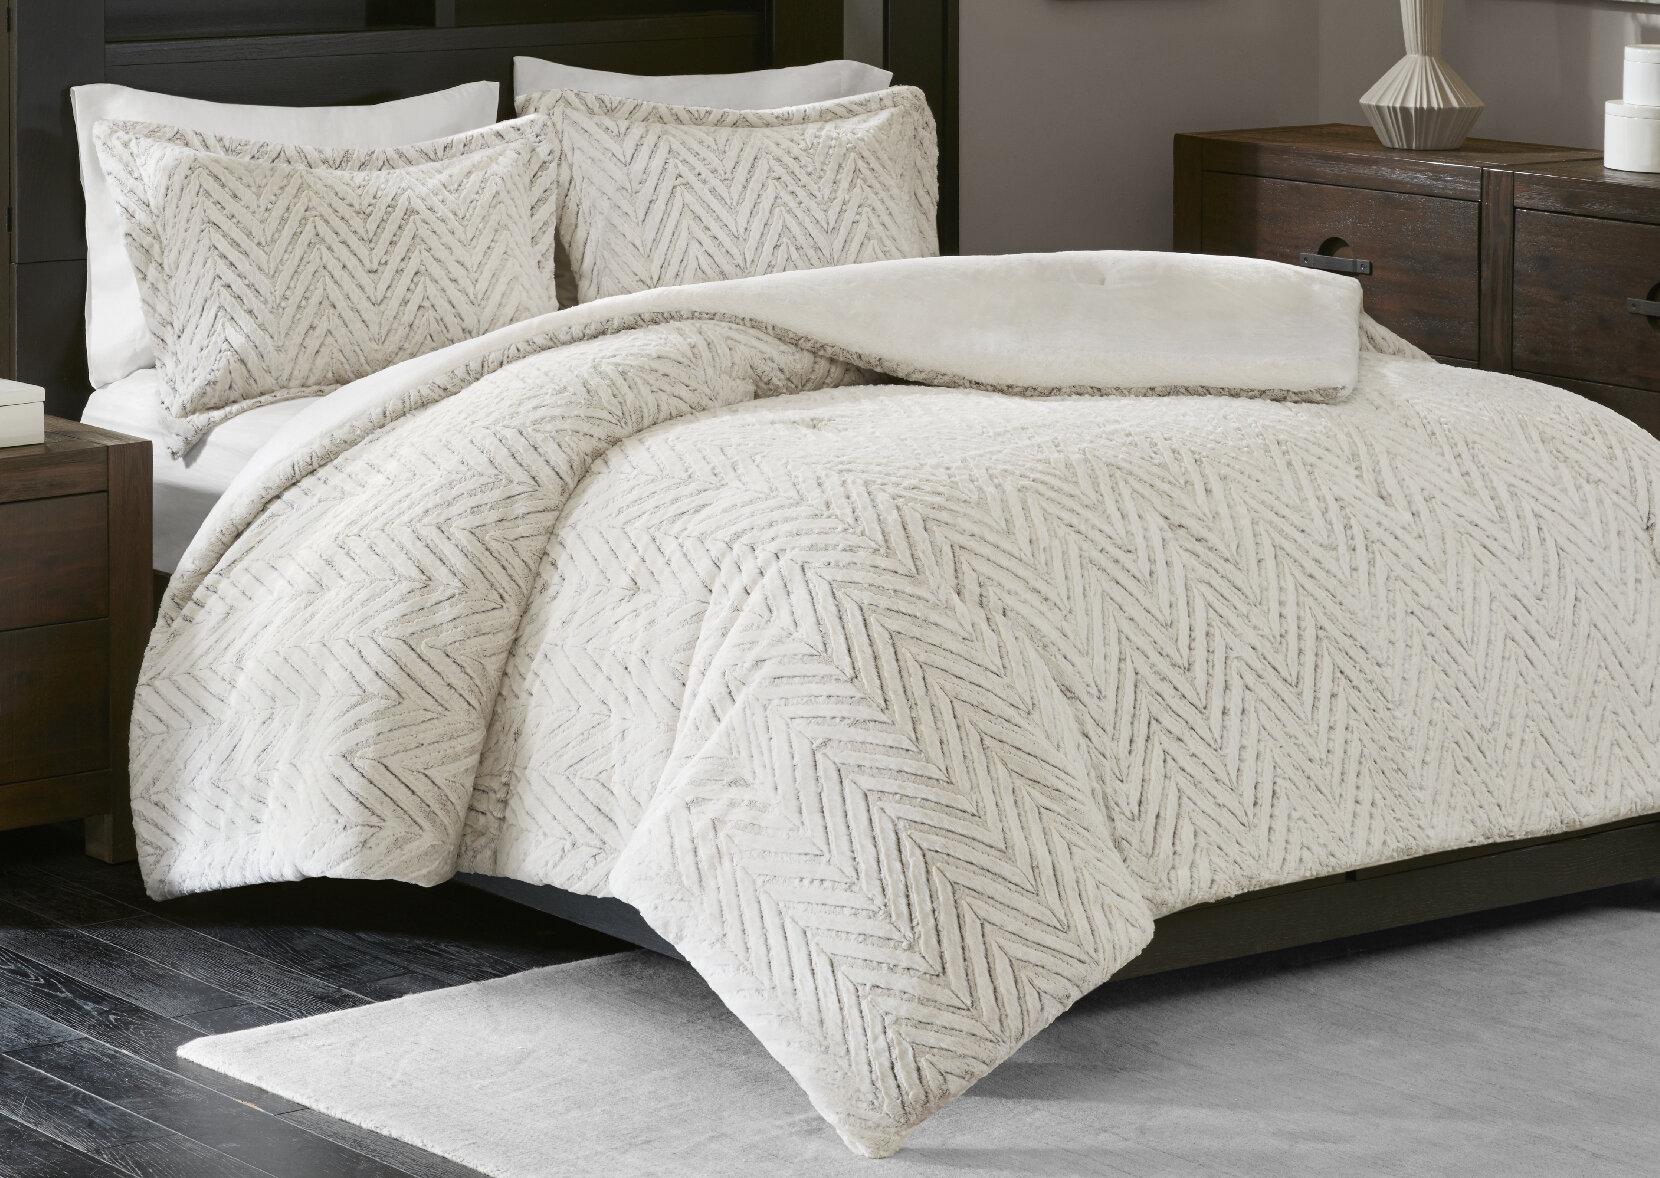 The Twillery Co Hazlehurst Comforter Set Reviews Wayfair